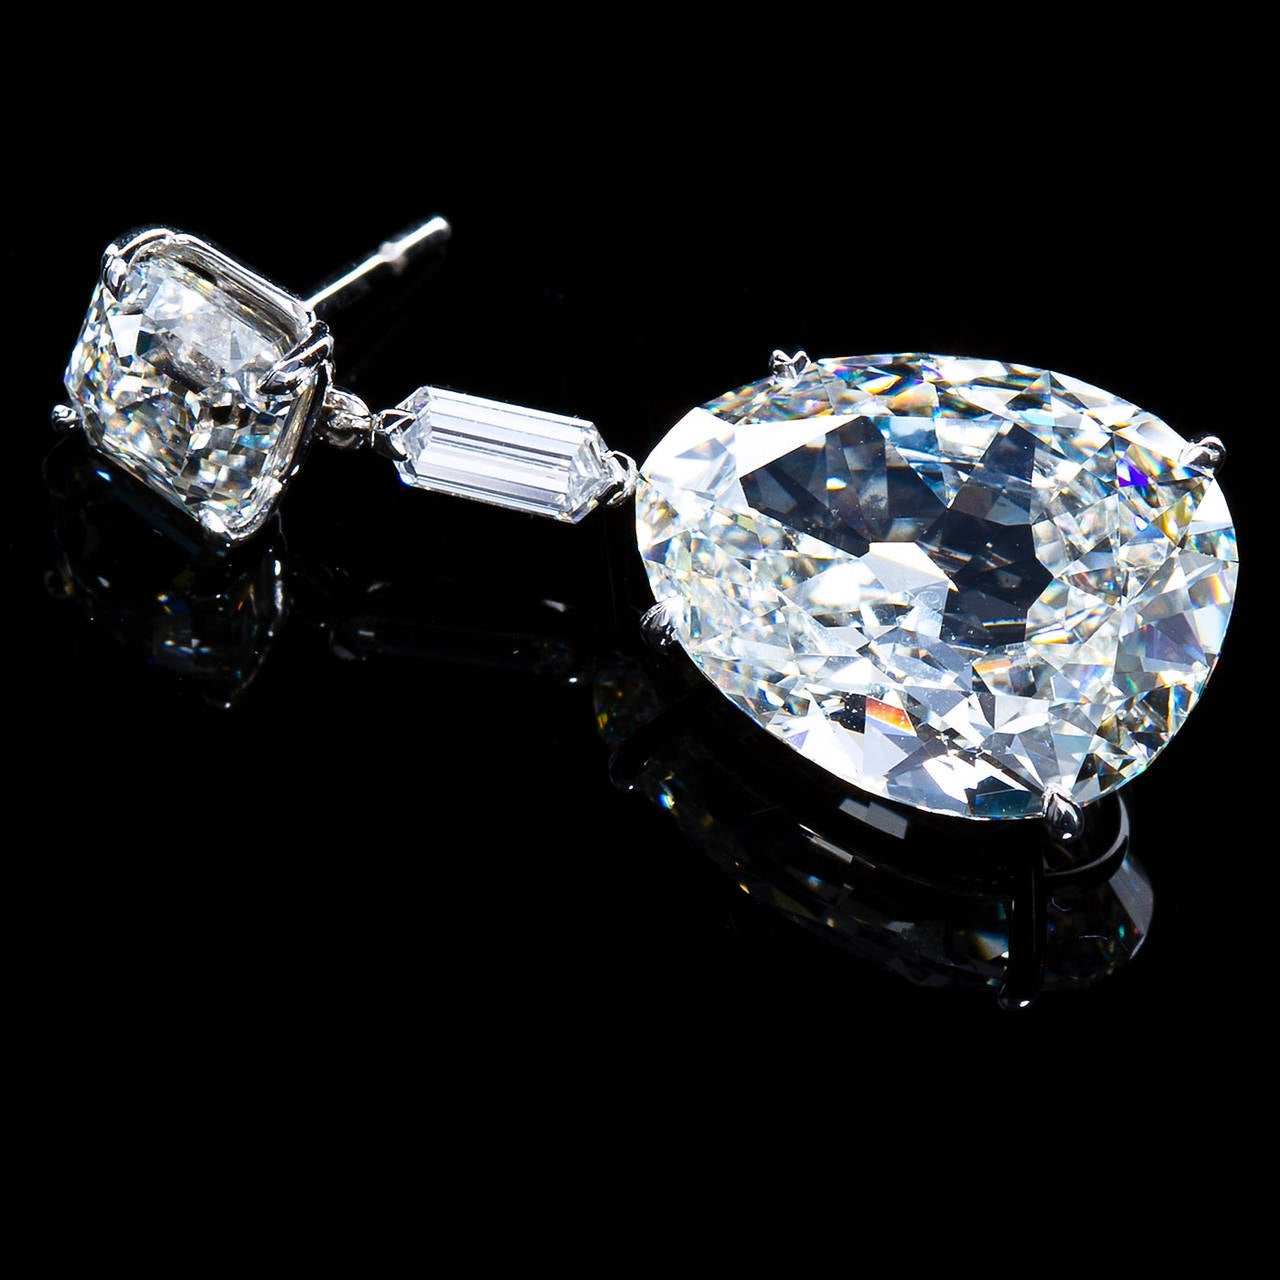 Important 19 Carat Gia Cert Antique Pear Diamond Drop Earrings 3